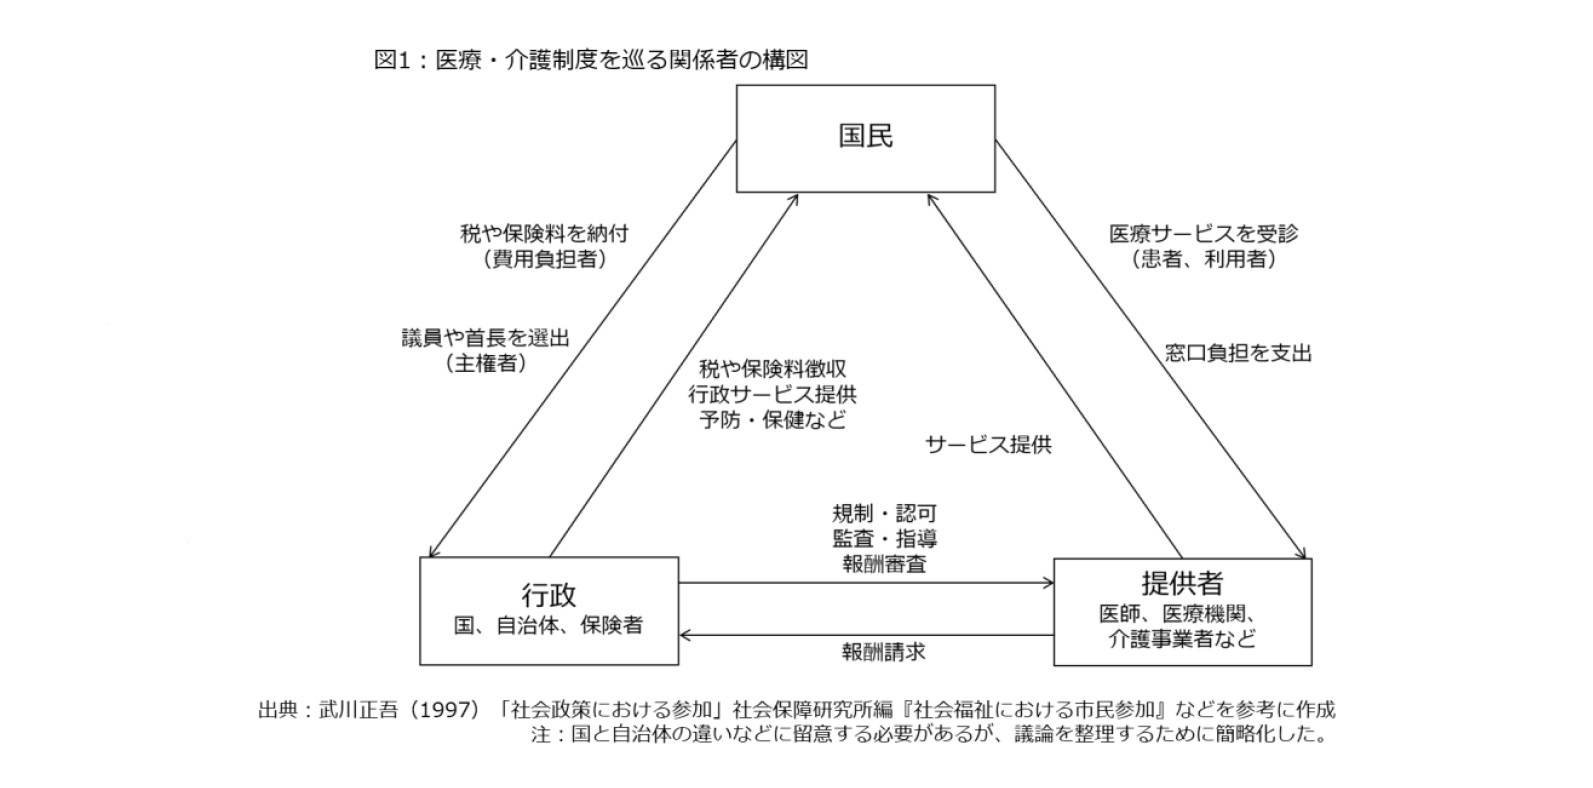 図1:医療・介護制度を巡る関係者の構図